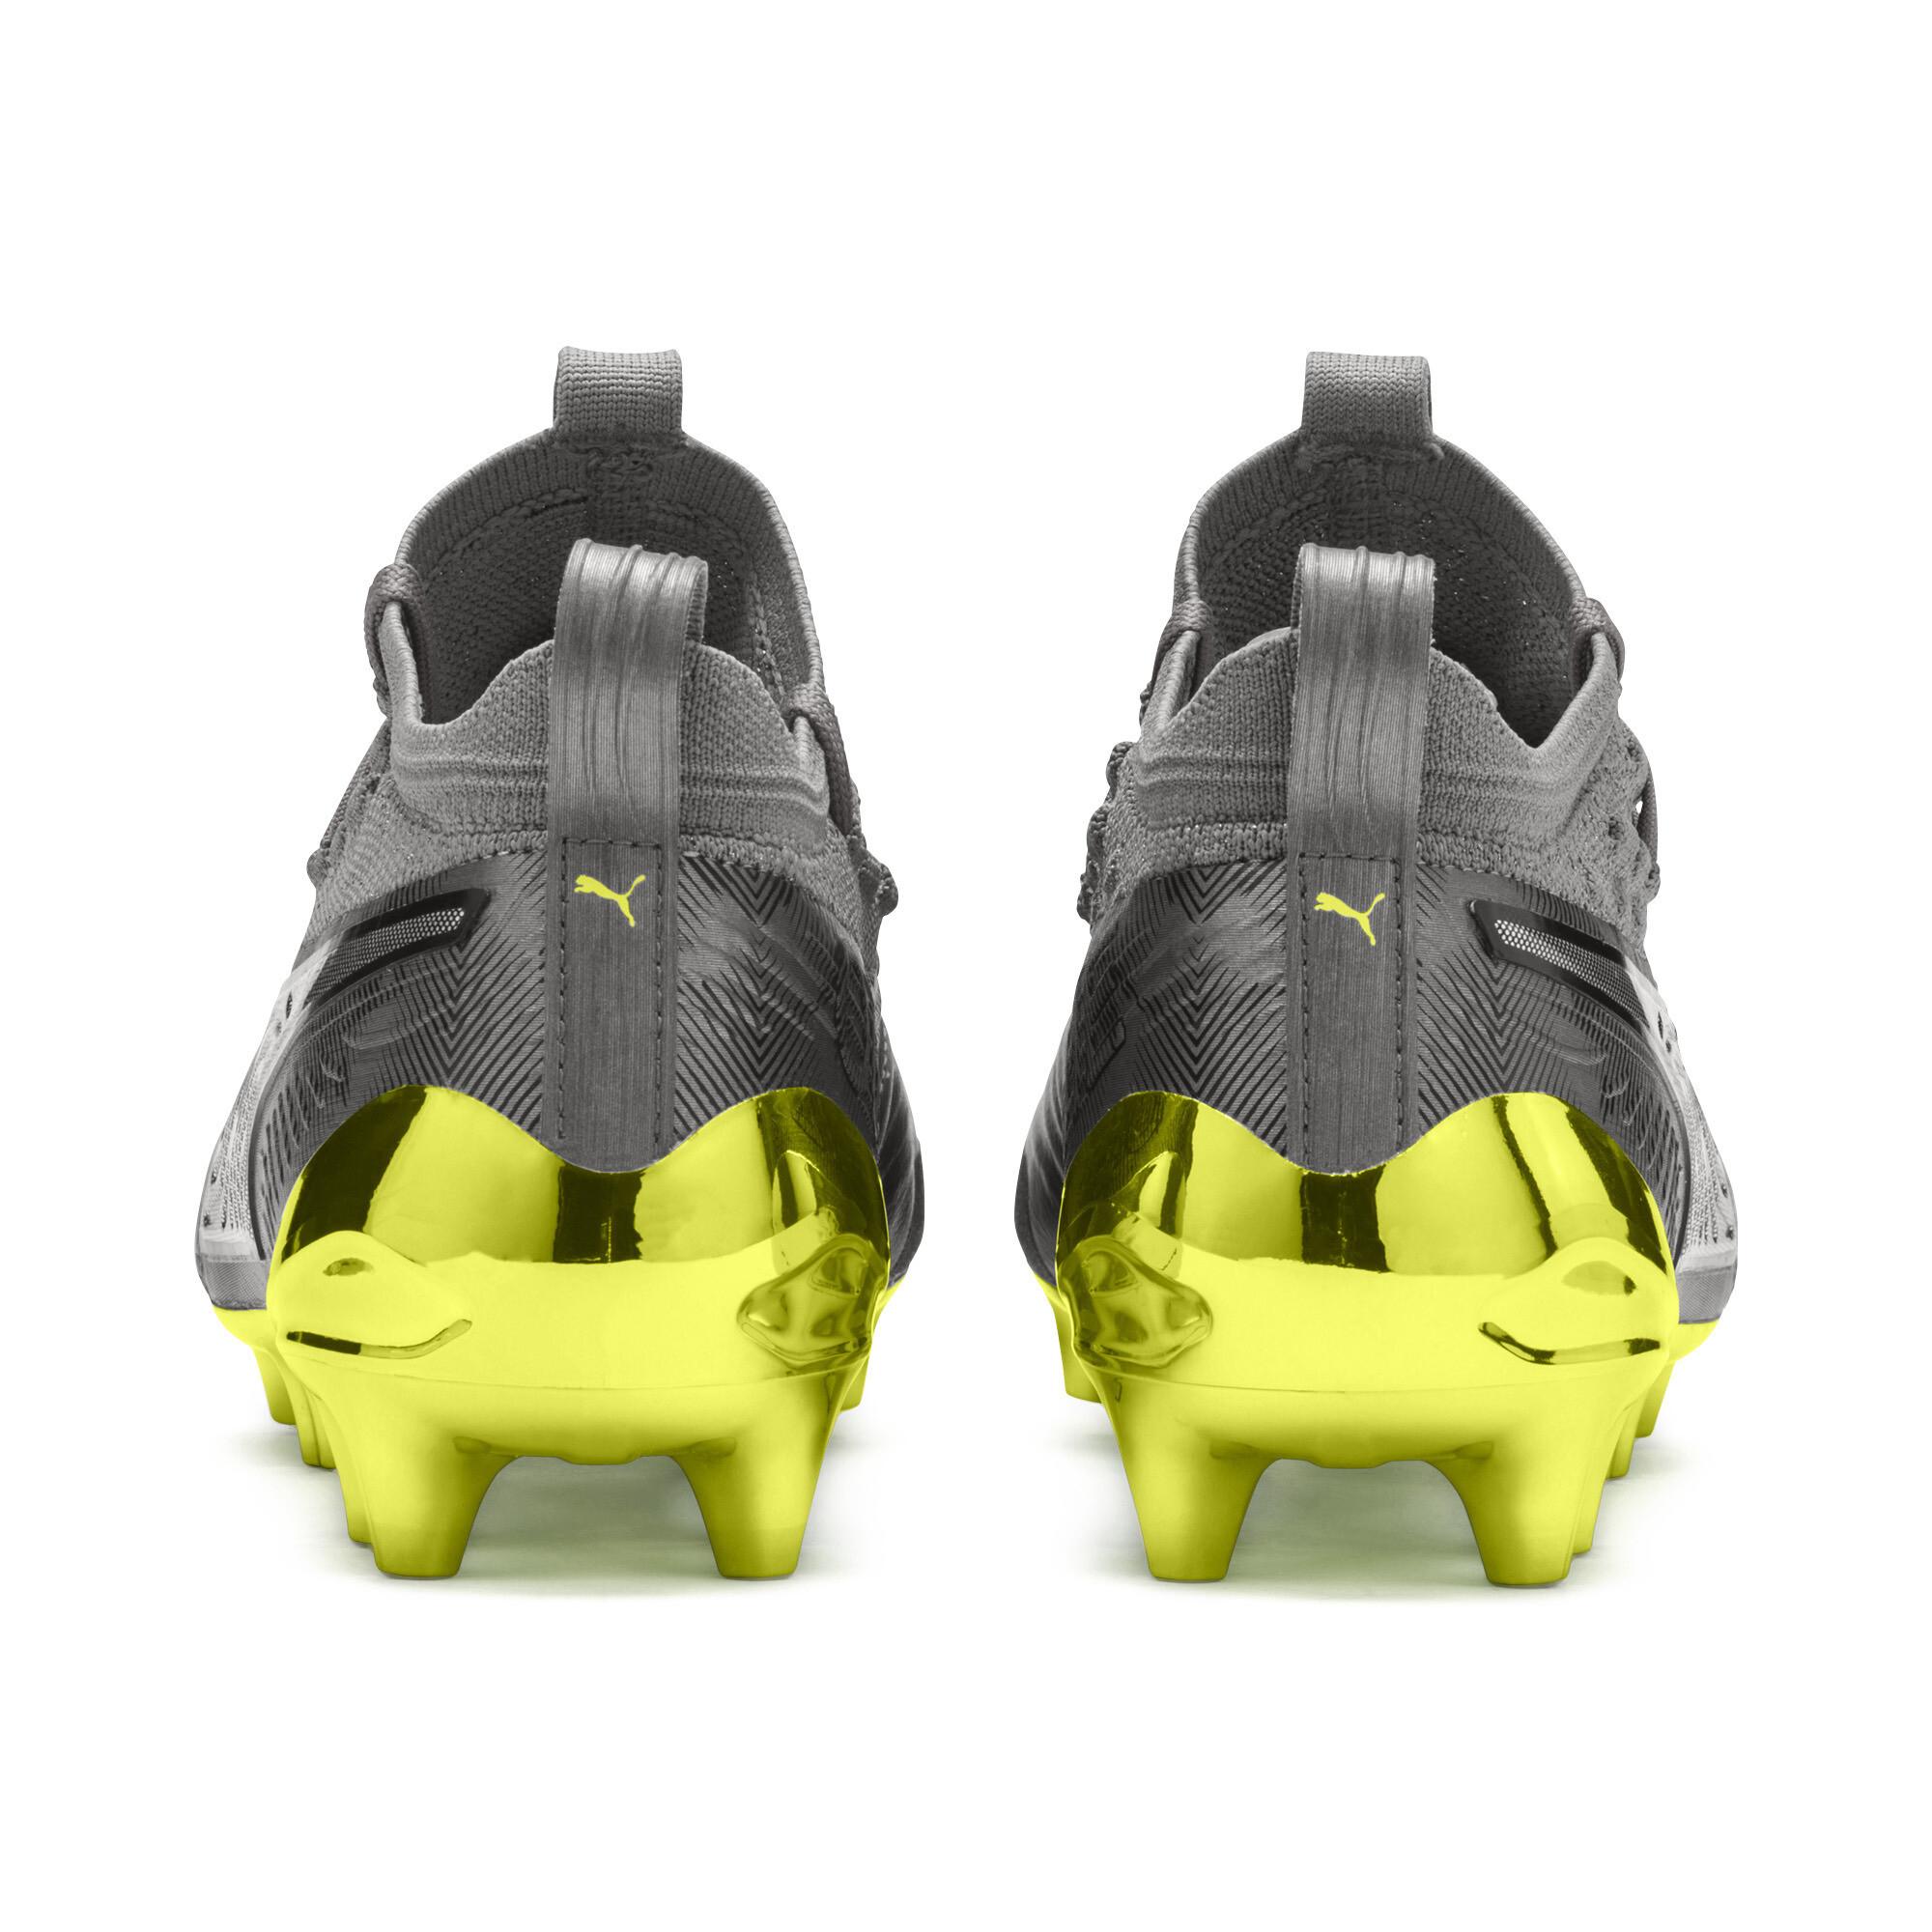 Image Puma PUMA ONE 19.1 Limited Edition FG/AG Men's Football Boots #3